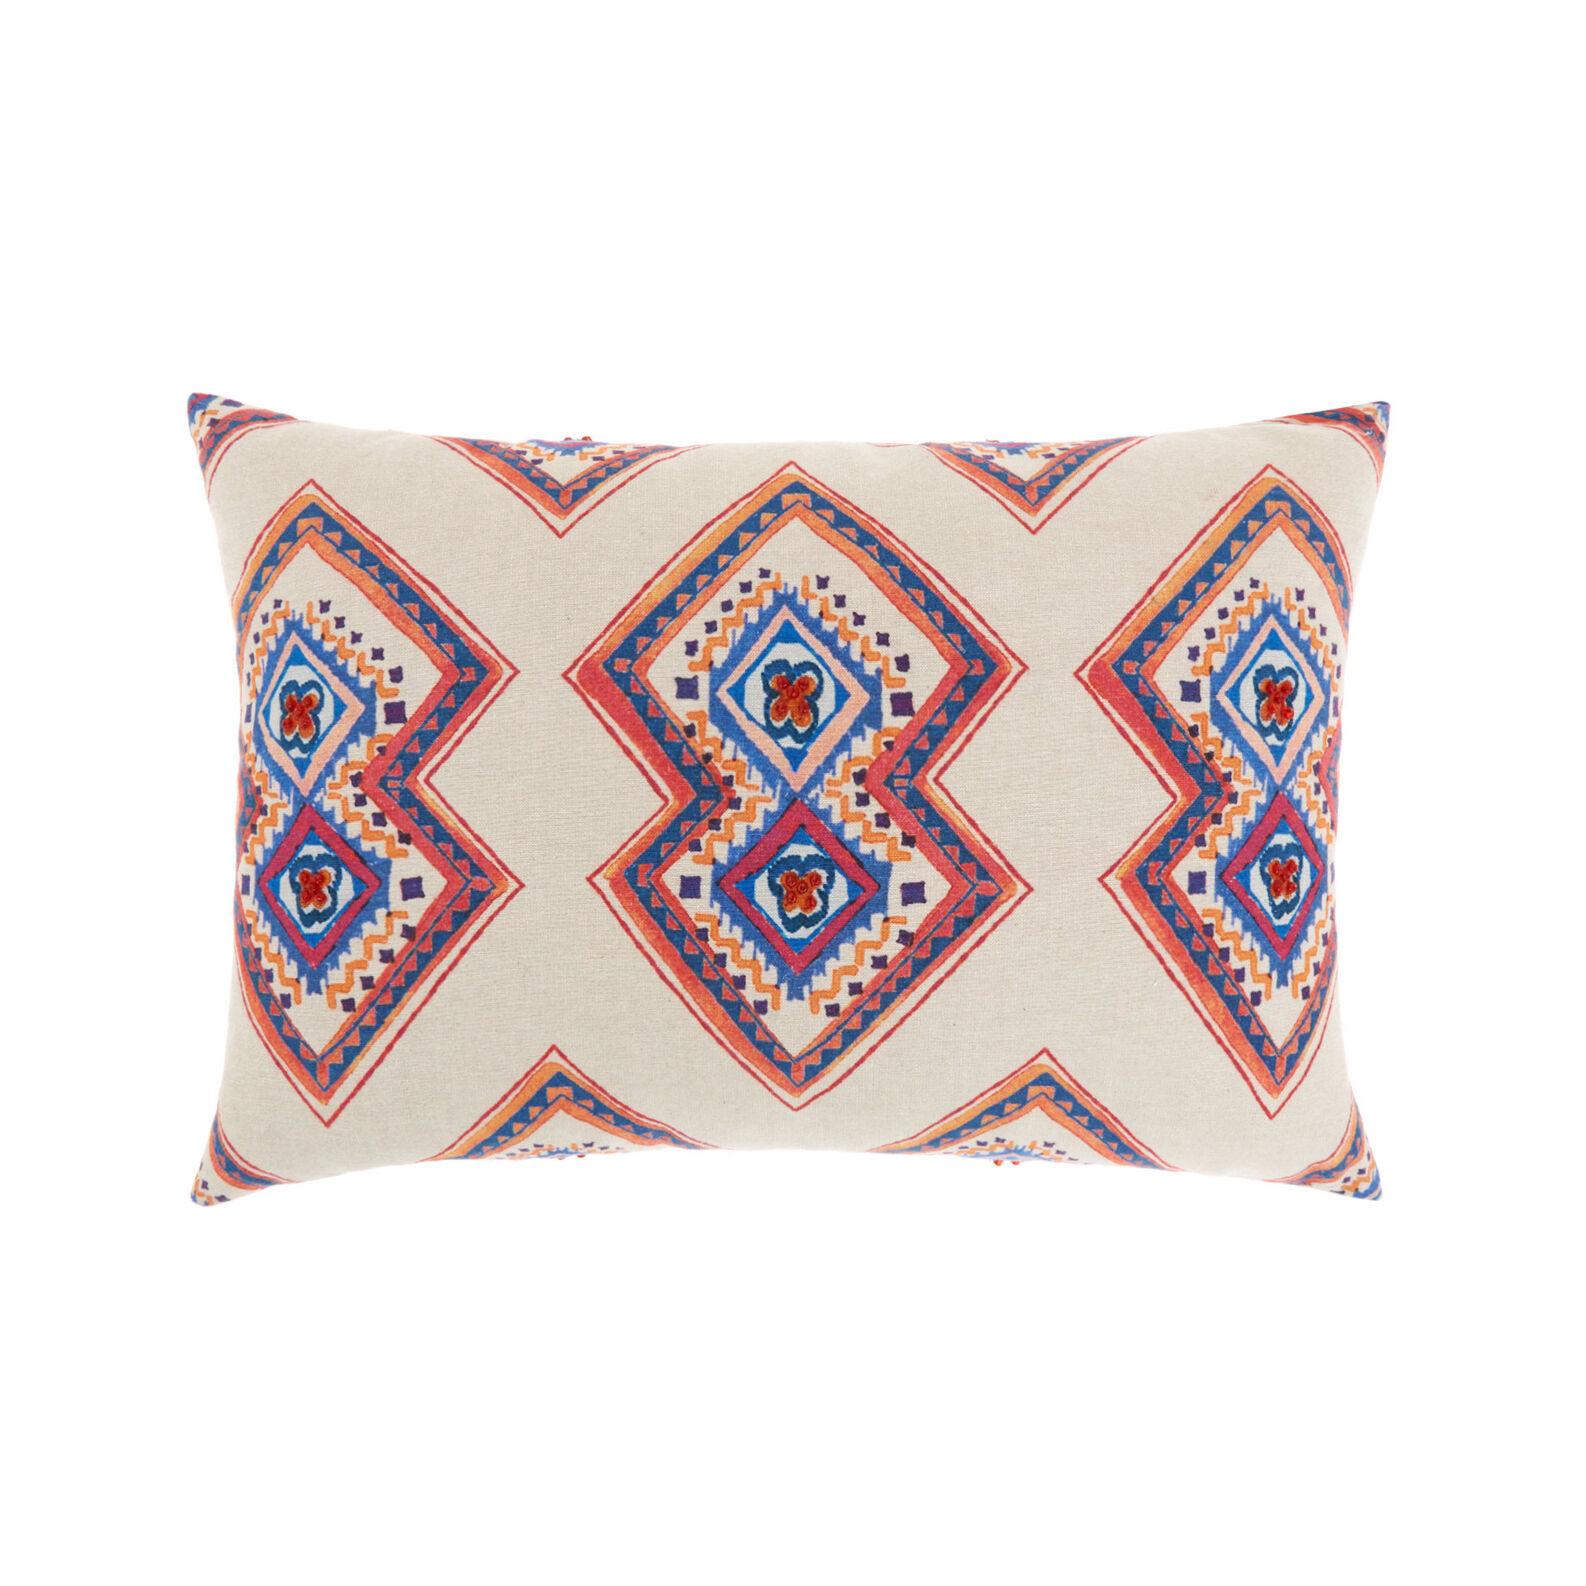 Cotton cushion with geometric print 35 x 50 cm